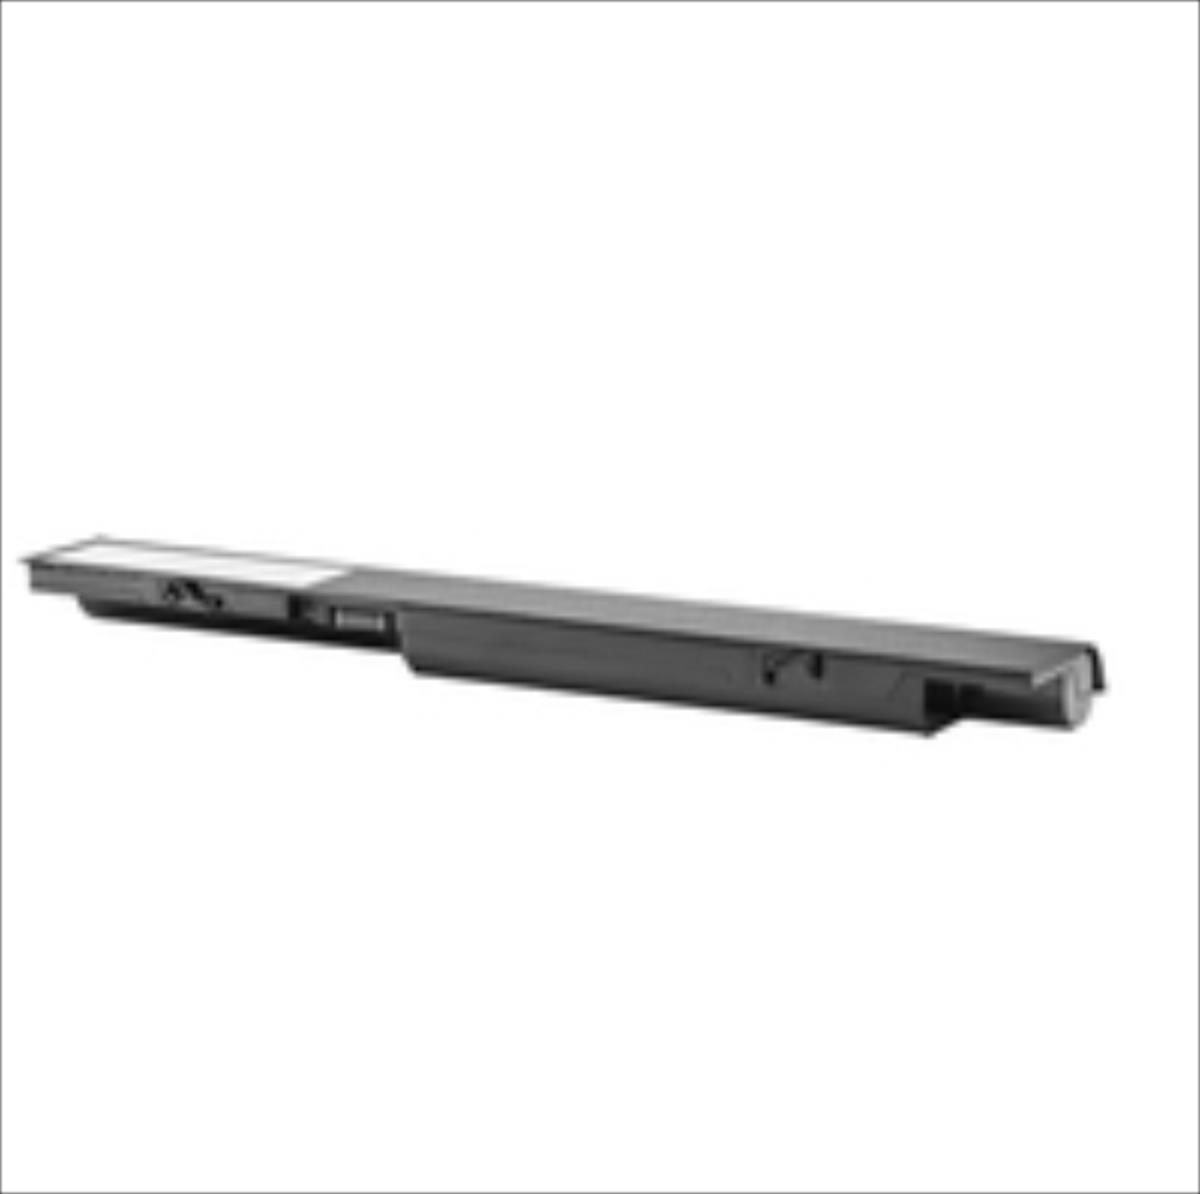 Hewlett-Packard FP06 NOTEBOOK BATTERY (H6L26AA) akumulators, baterija portatīvajiem datoriem